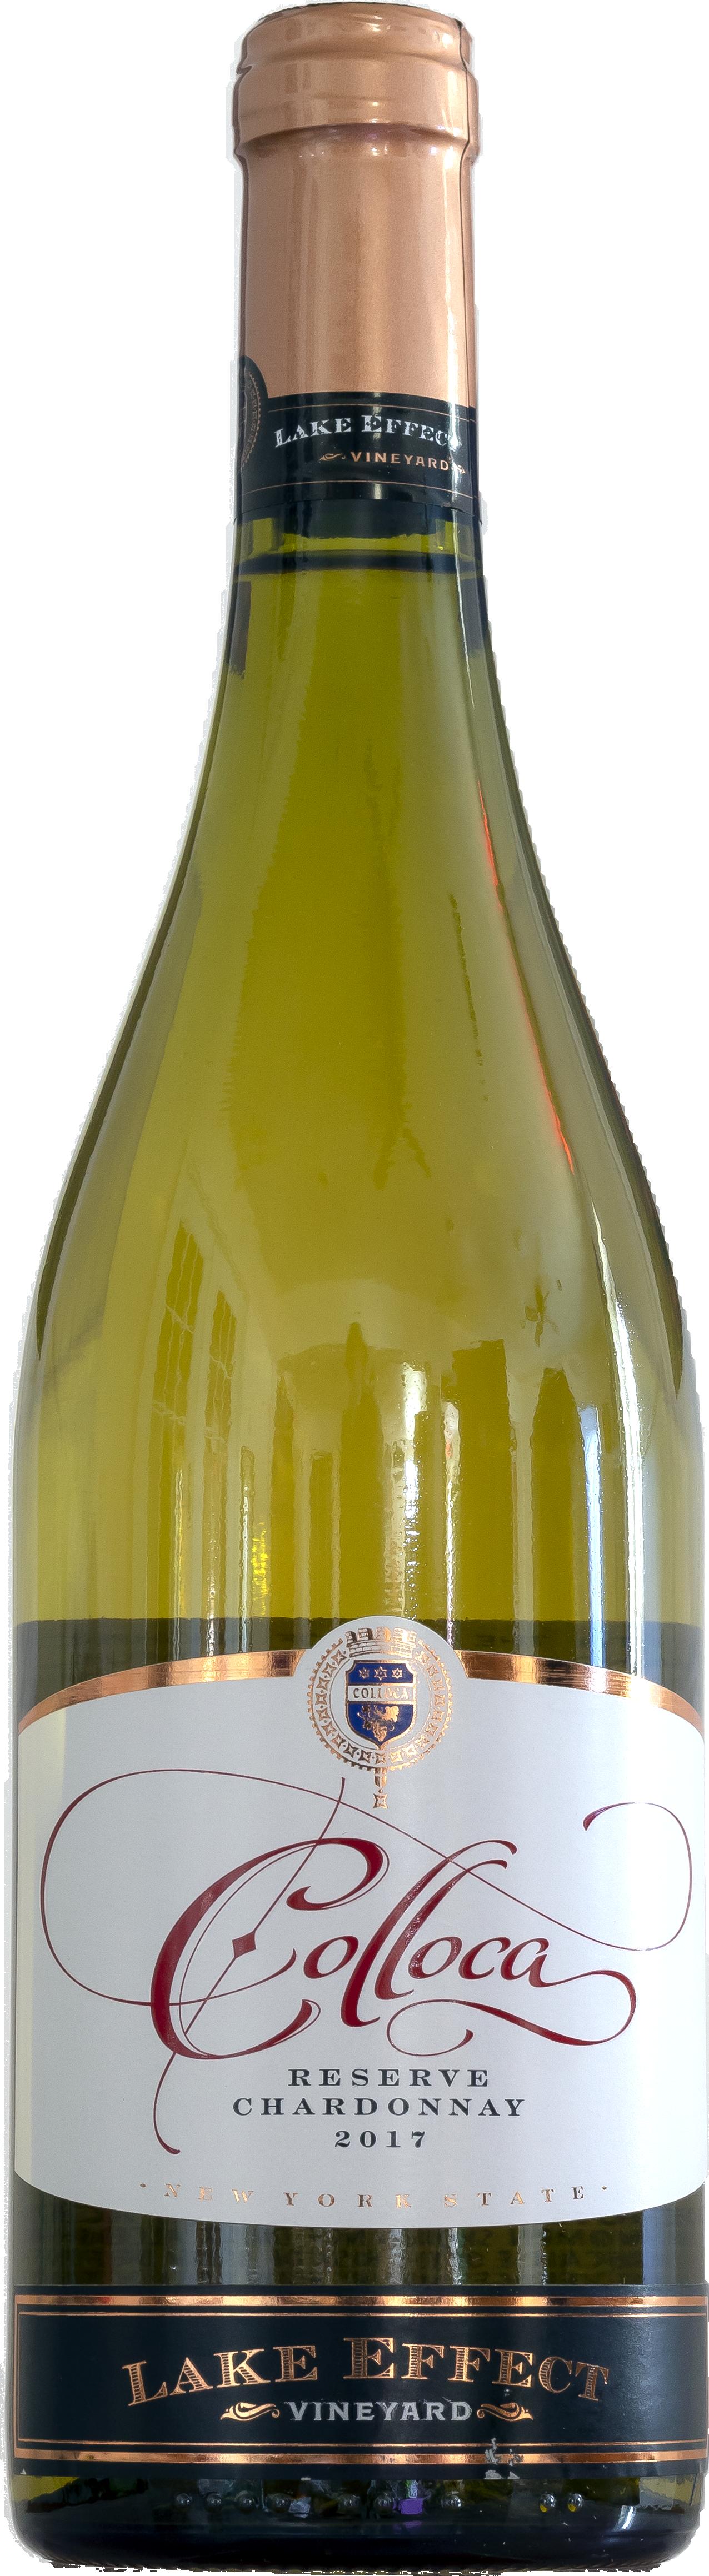 2017 Colloca Estate Lake Effect Vineyard® Reserve Chardonnay -